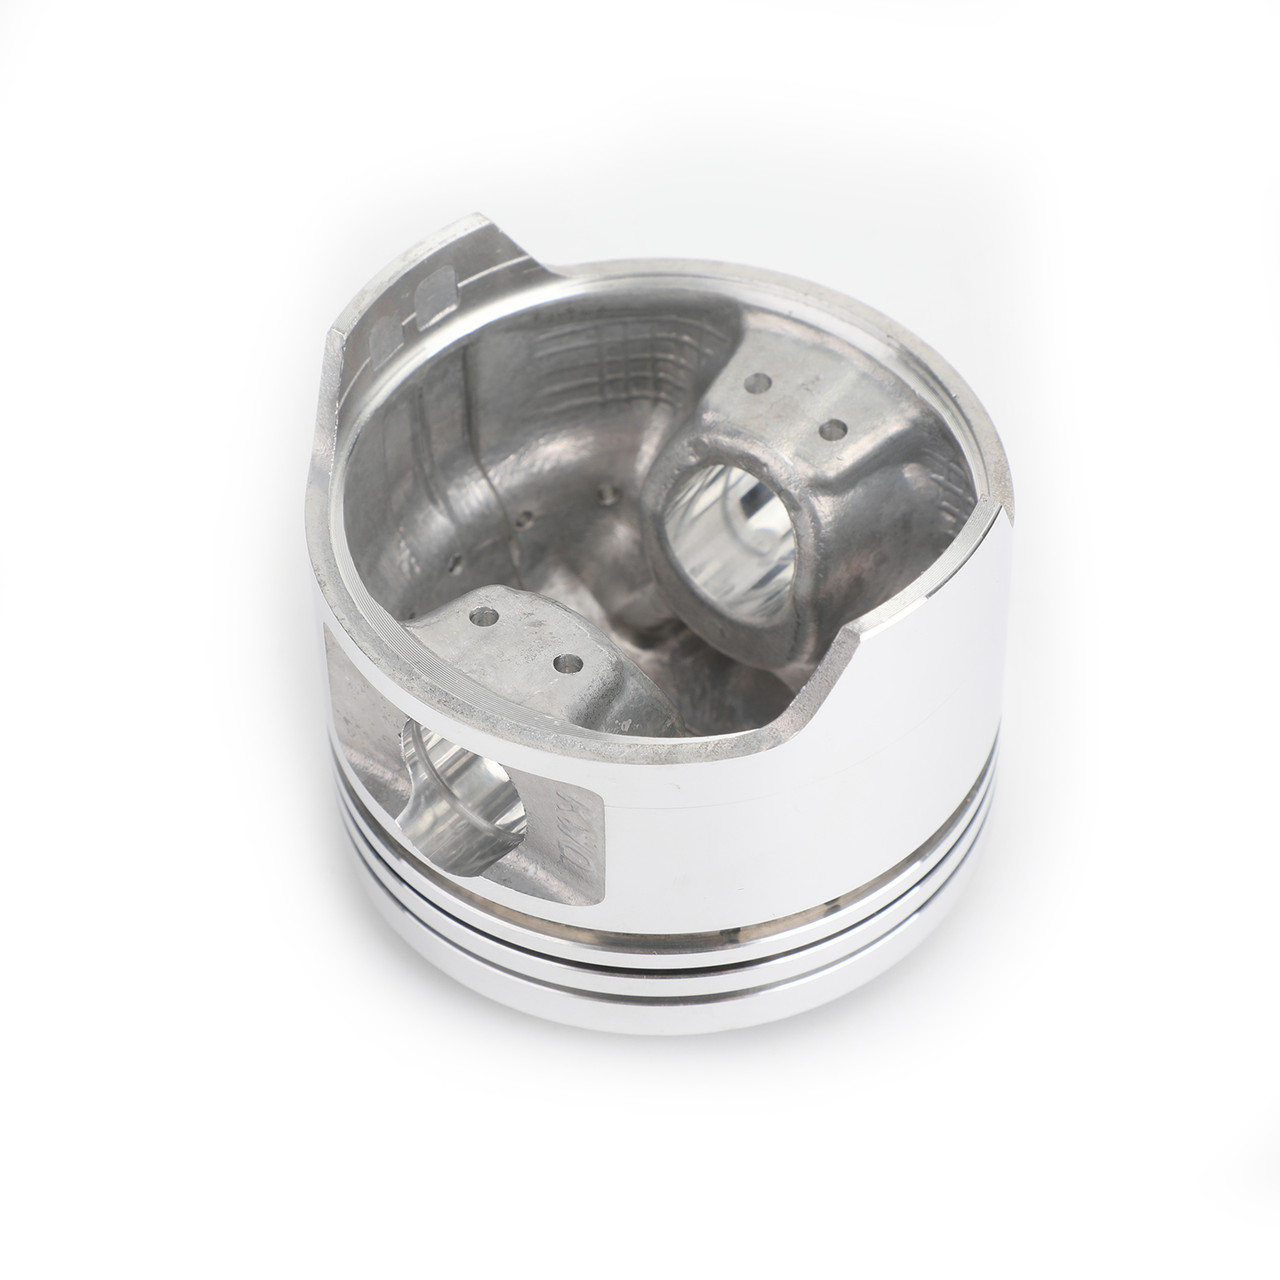 Engine Piston Rings Pin Kit Standard For Honda VRX400T (NC33) 1996 NV400 CJ/CK Steed 400 92-93 NV400 CS/CV Steed 400 95-97 NT400 Bros 400 (NC25) 88-92